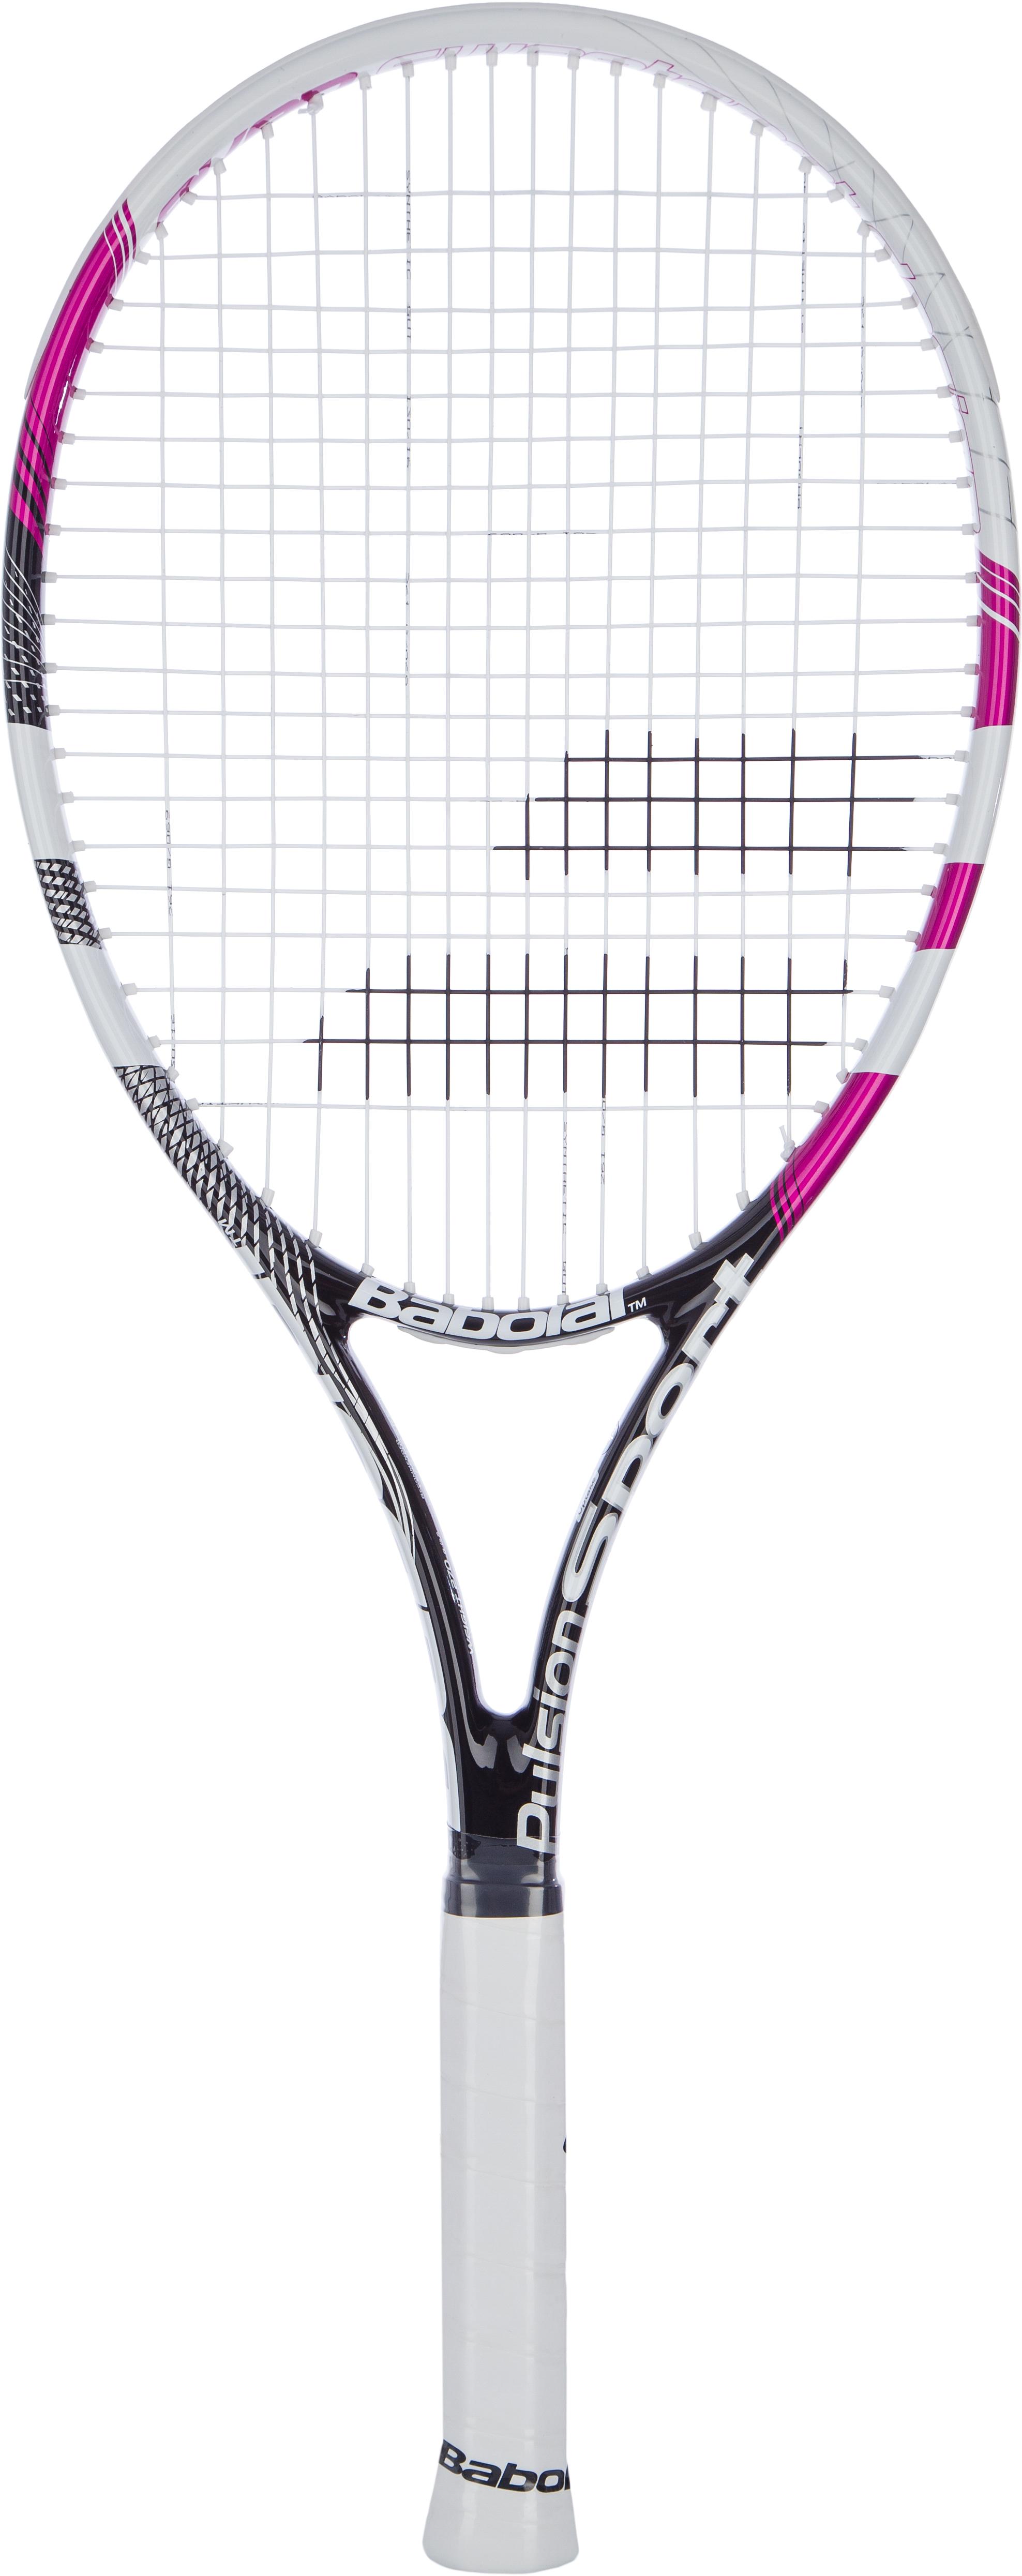 Babolat Ракетка для большого тенниса Babolat Pulsion Sport Srtung цена